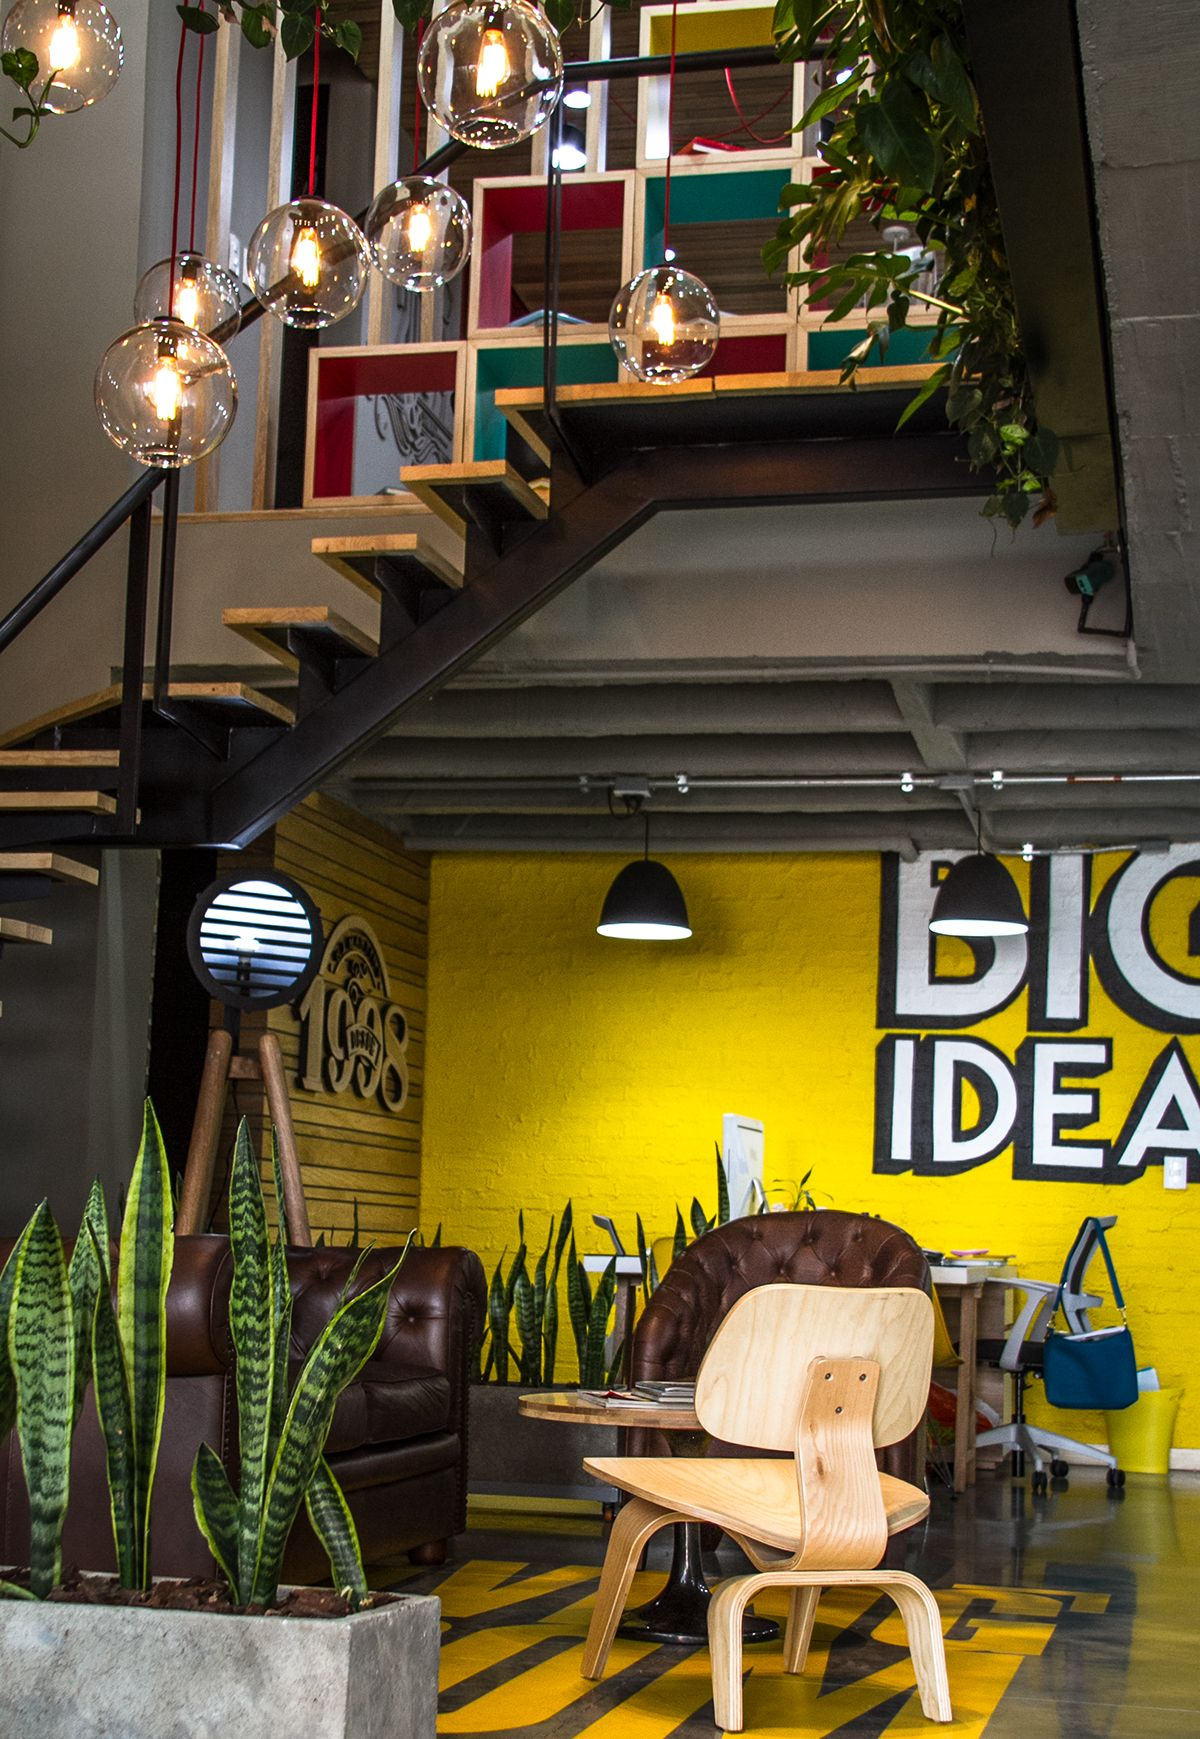 Home Interior Design Game Online: CJ MARTINS (proyecto En Construccion) On Behance